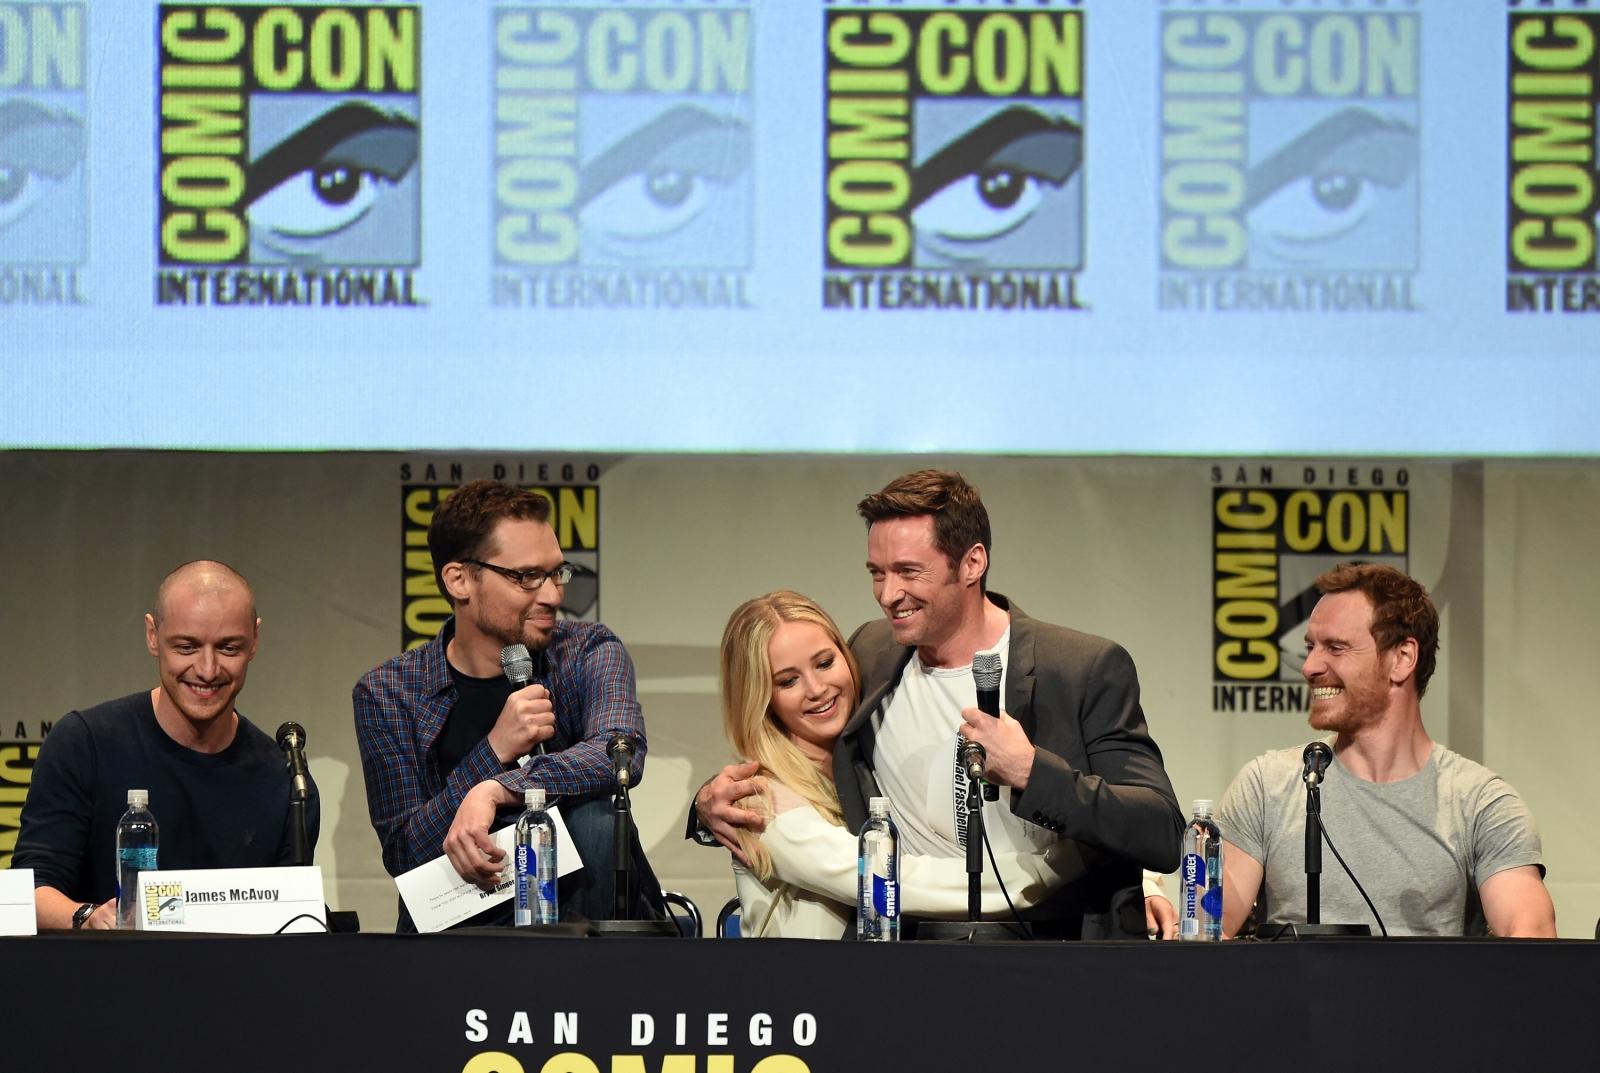 X-Men: Apocalypse panel at Comic-Con 2015